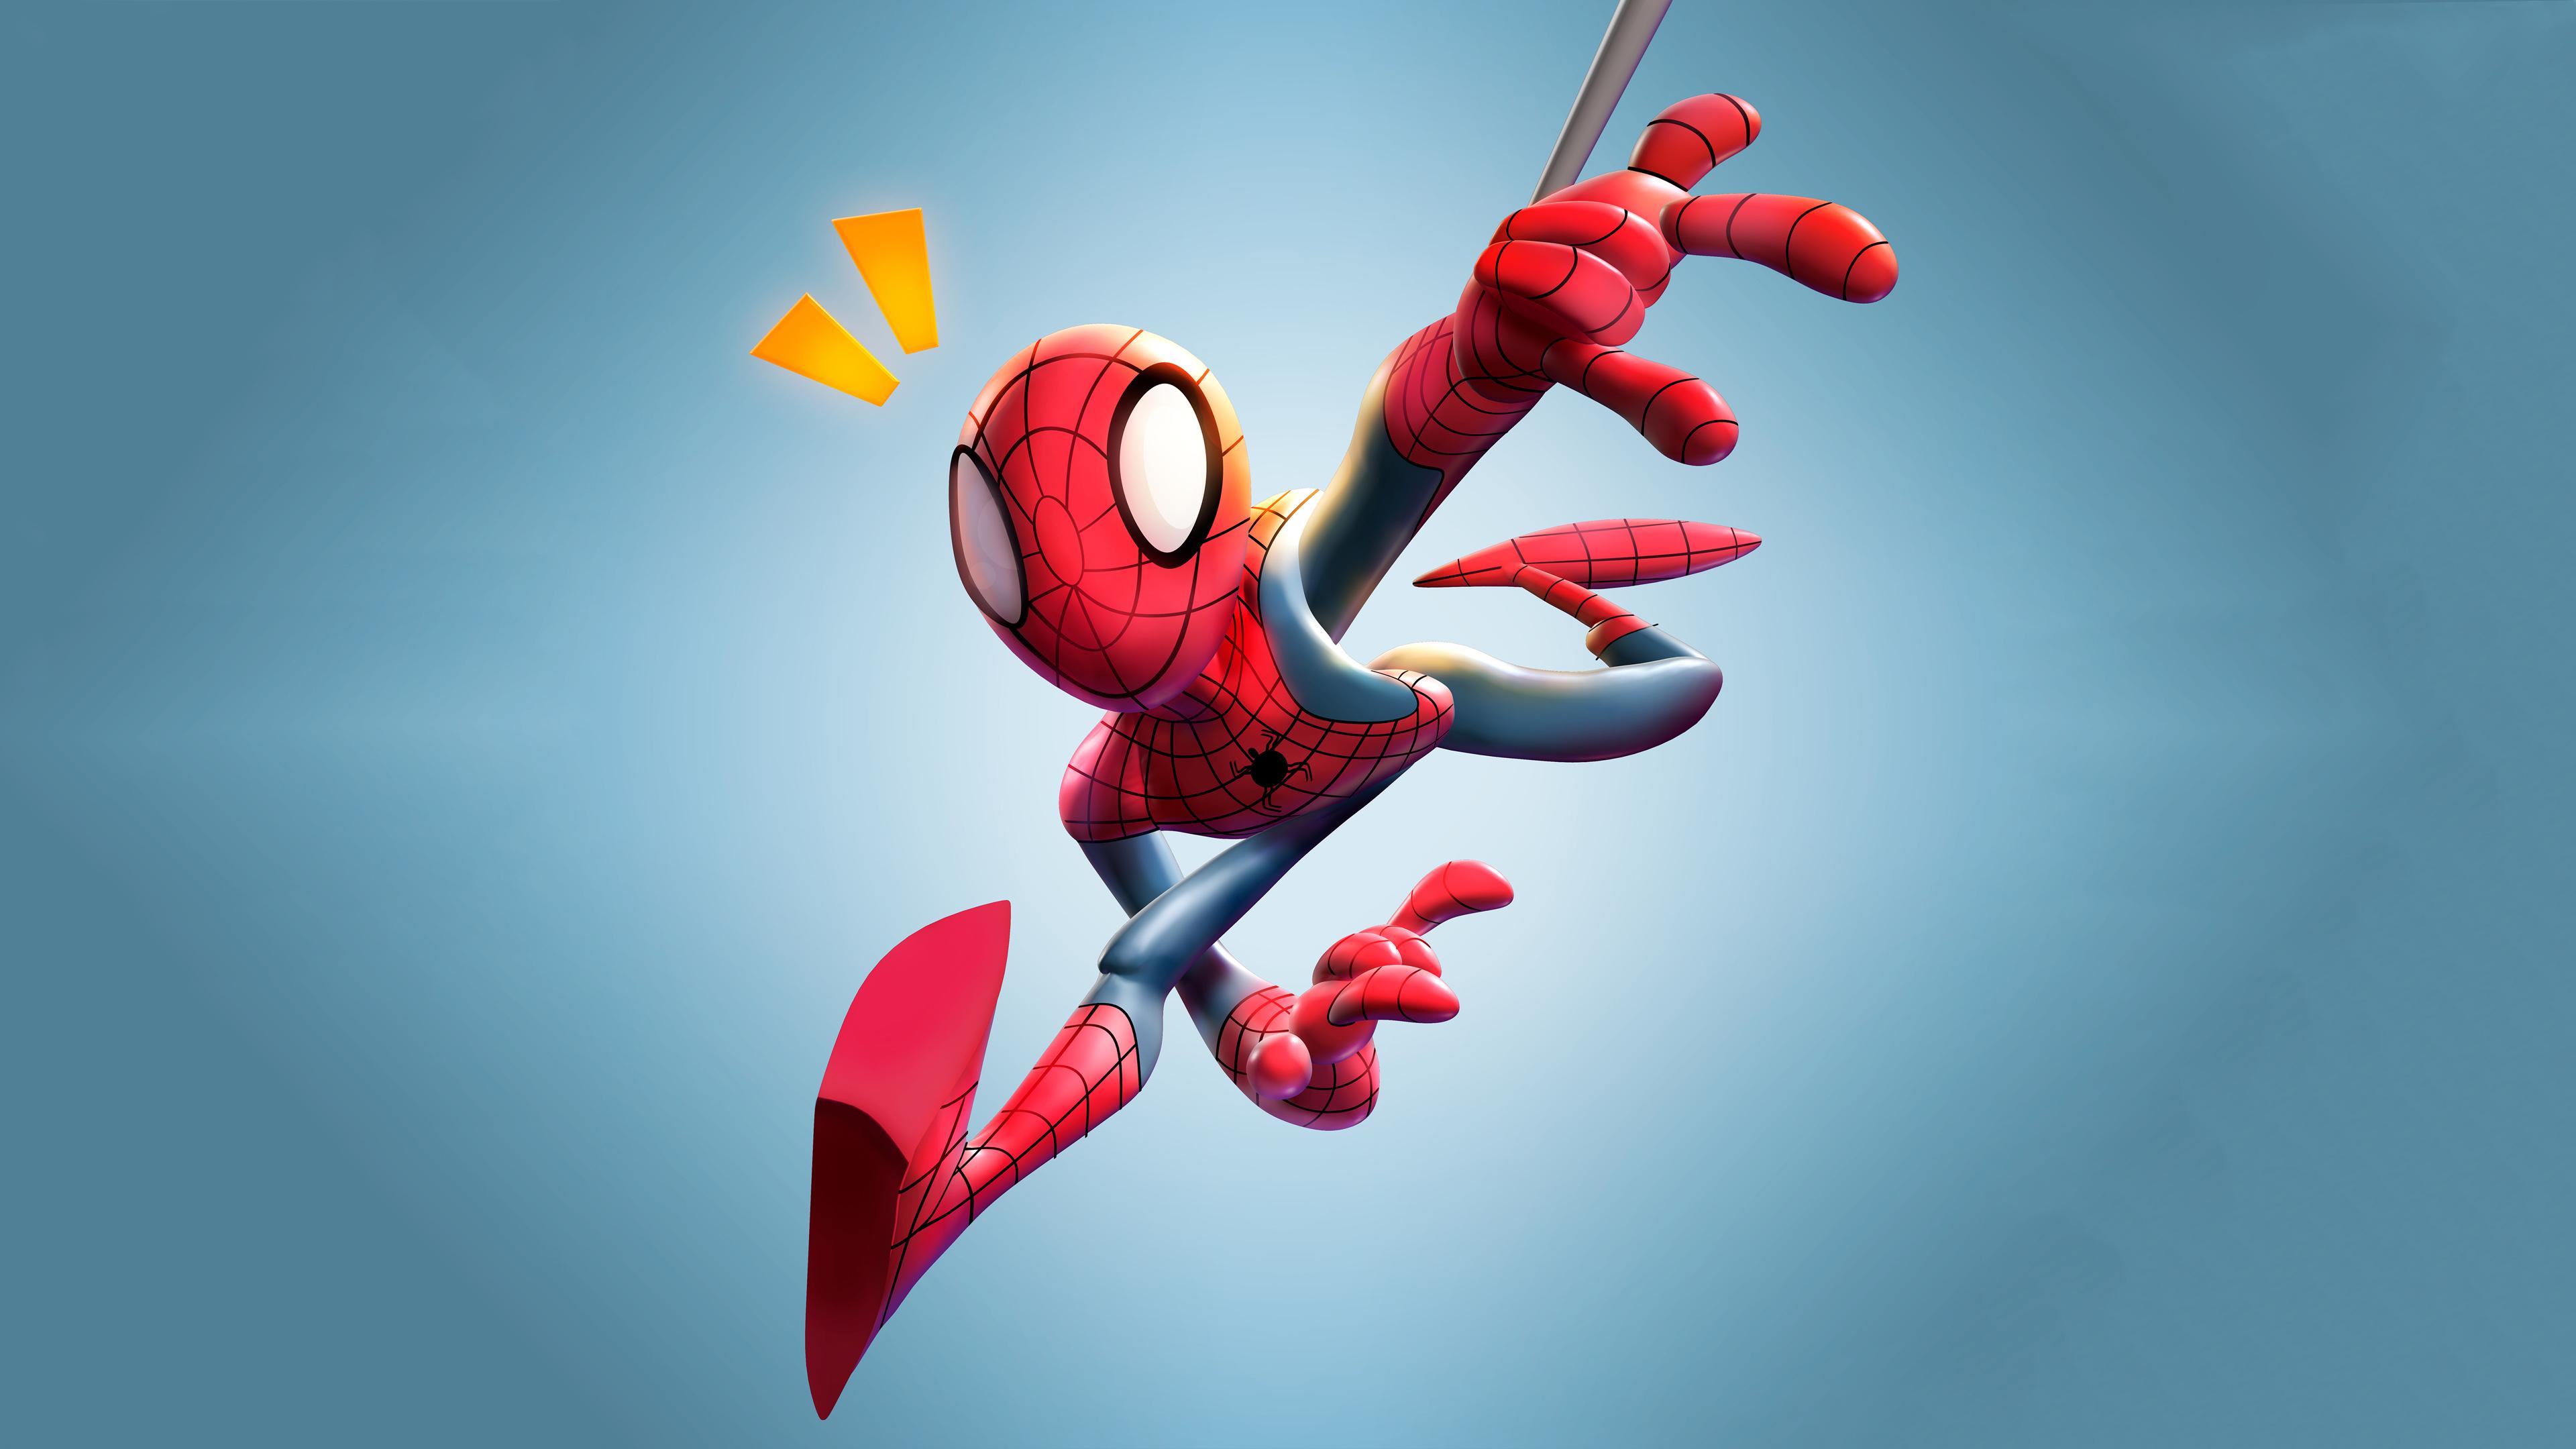 Wallpaper 4k Spiderman 3d Art Wallpaper